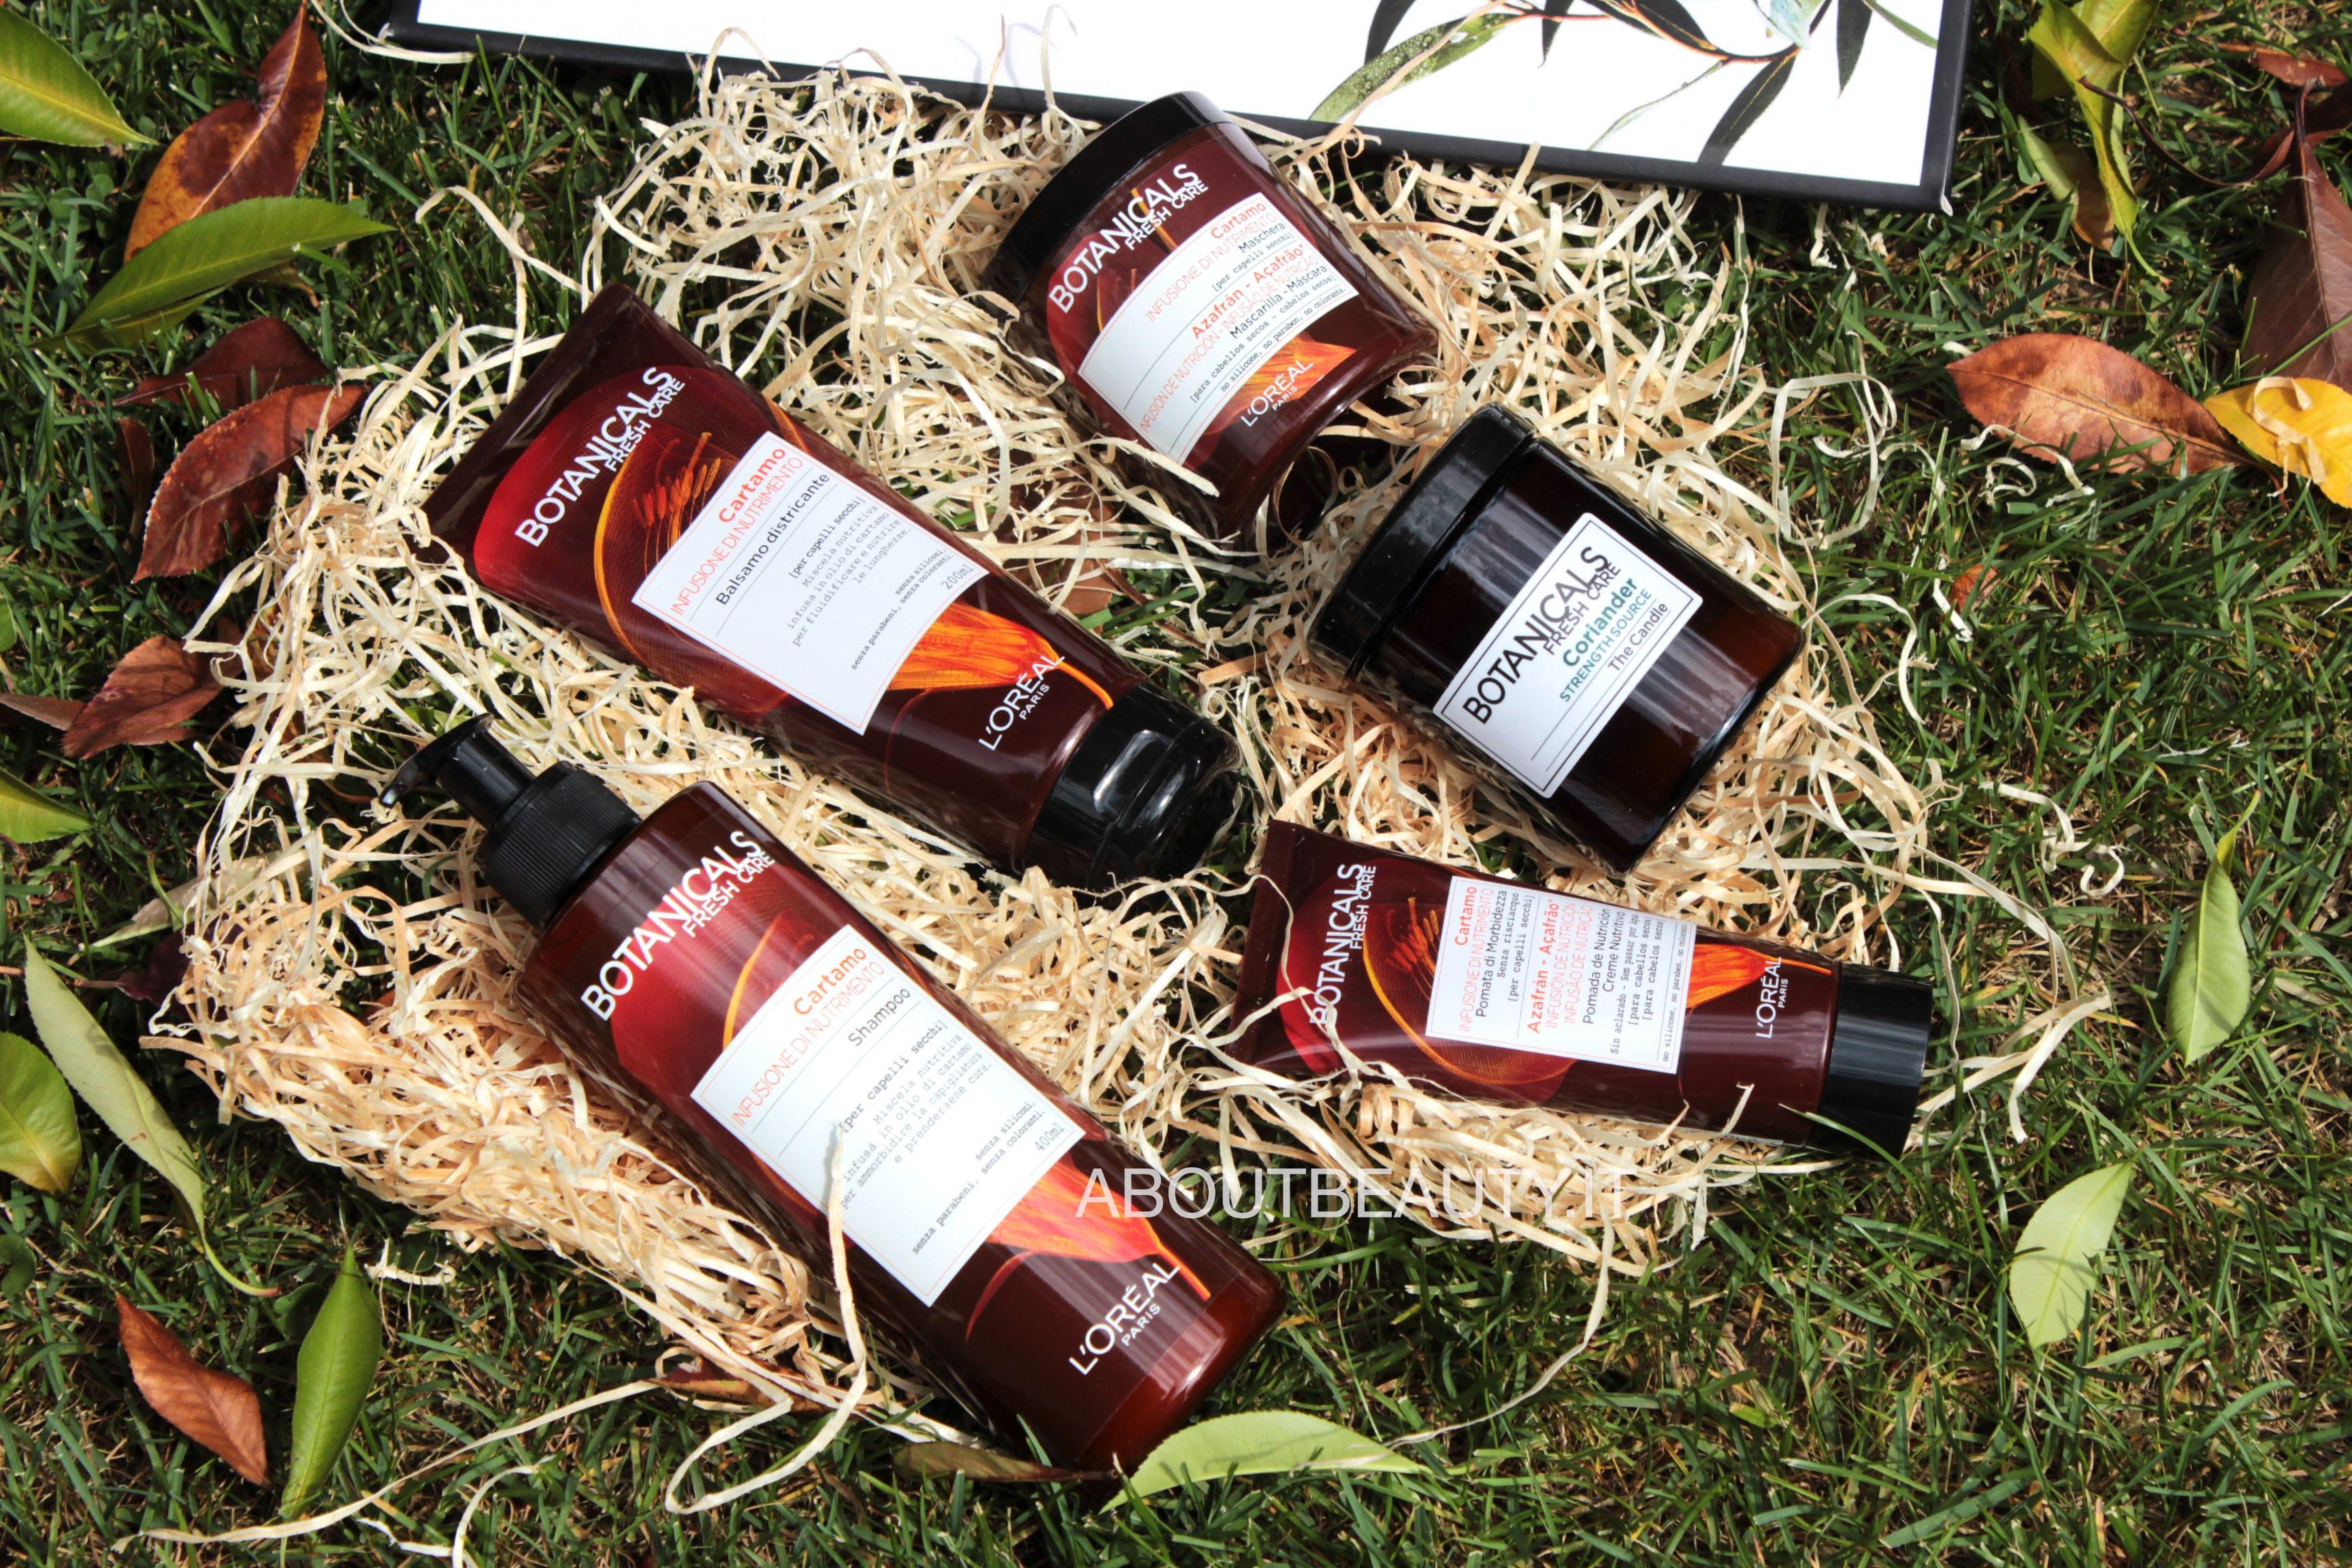 L'Oreal Botanicals Fresh Care, la linea al Cartamo per capelli secchi